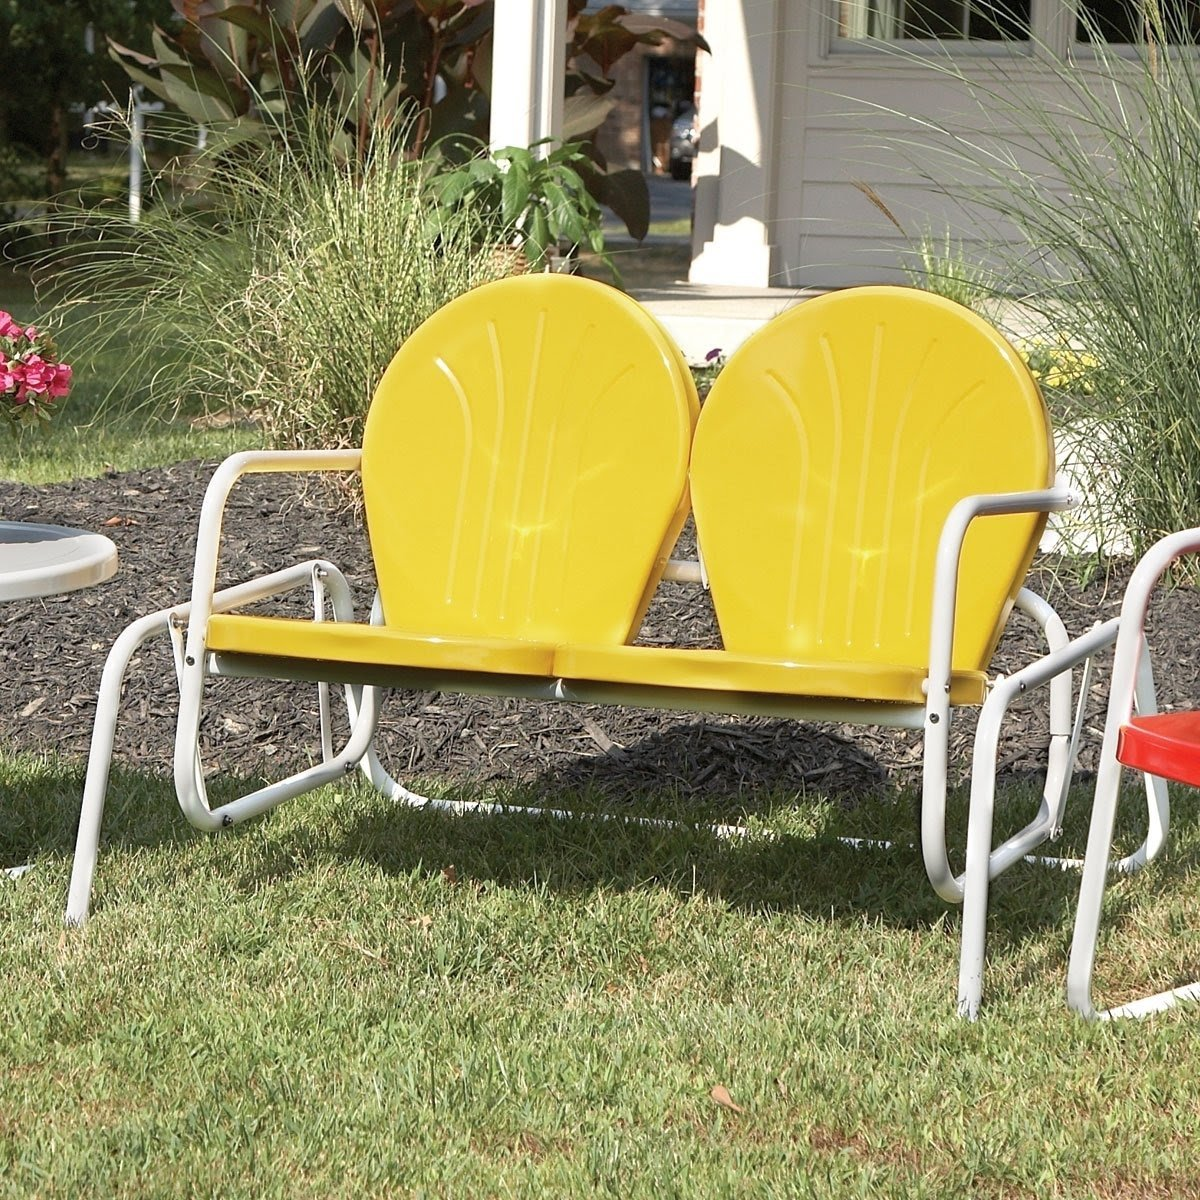 Vintage Metal Chairs Outdoor | Retro Metal Glider Lawn .